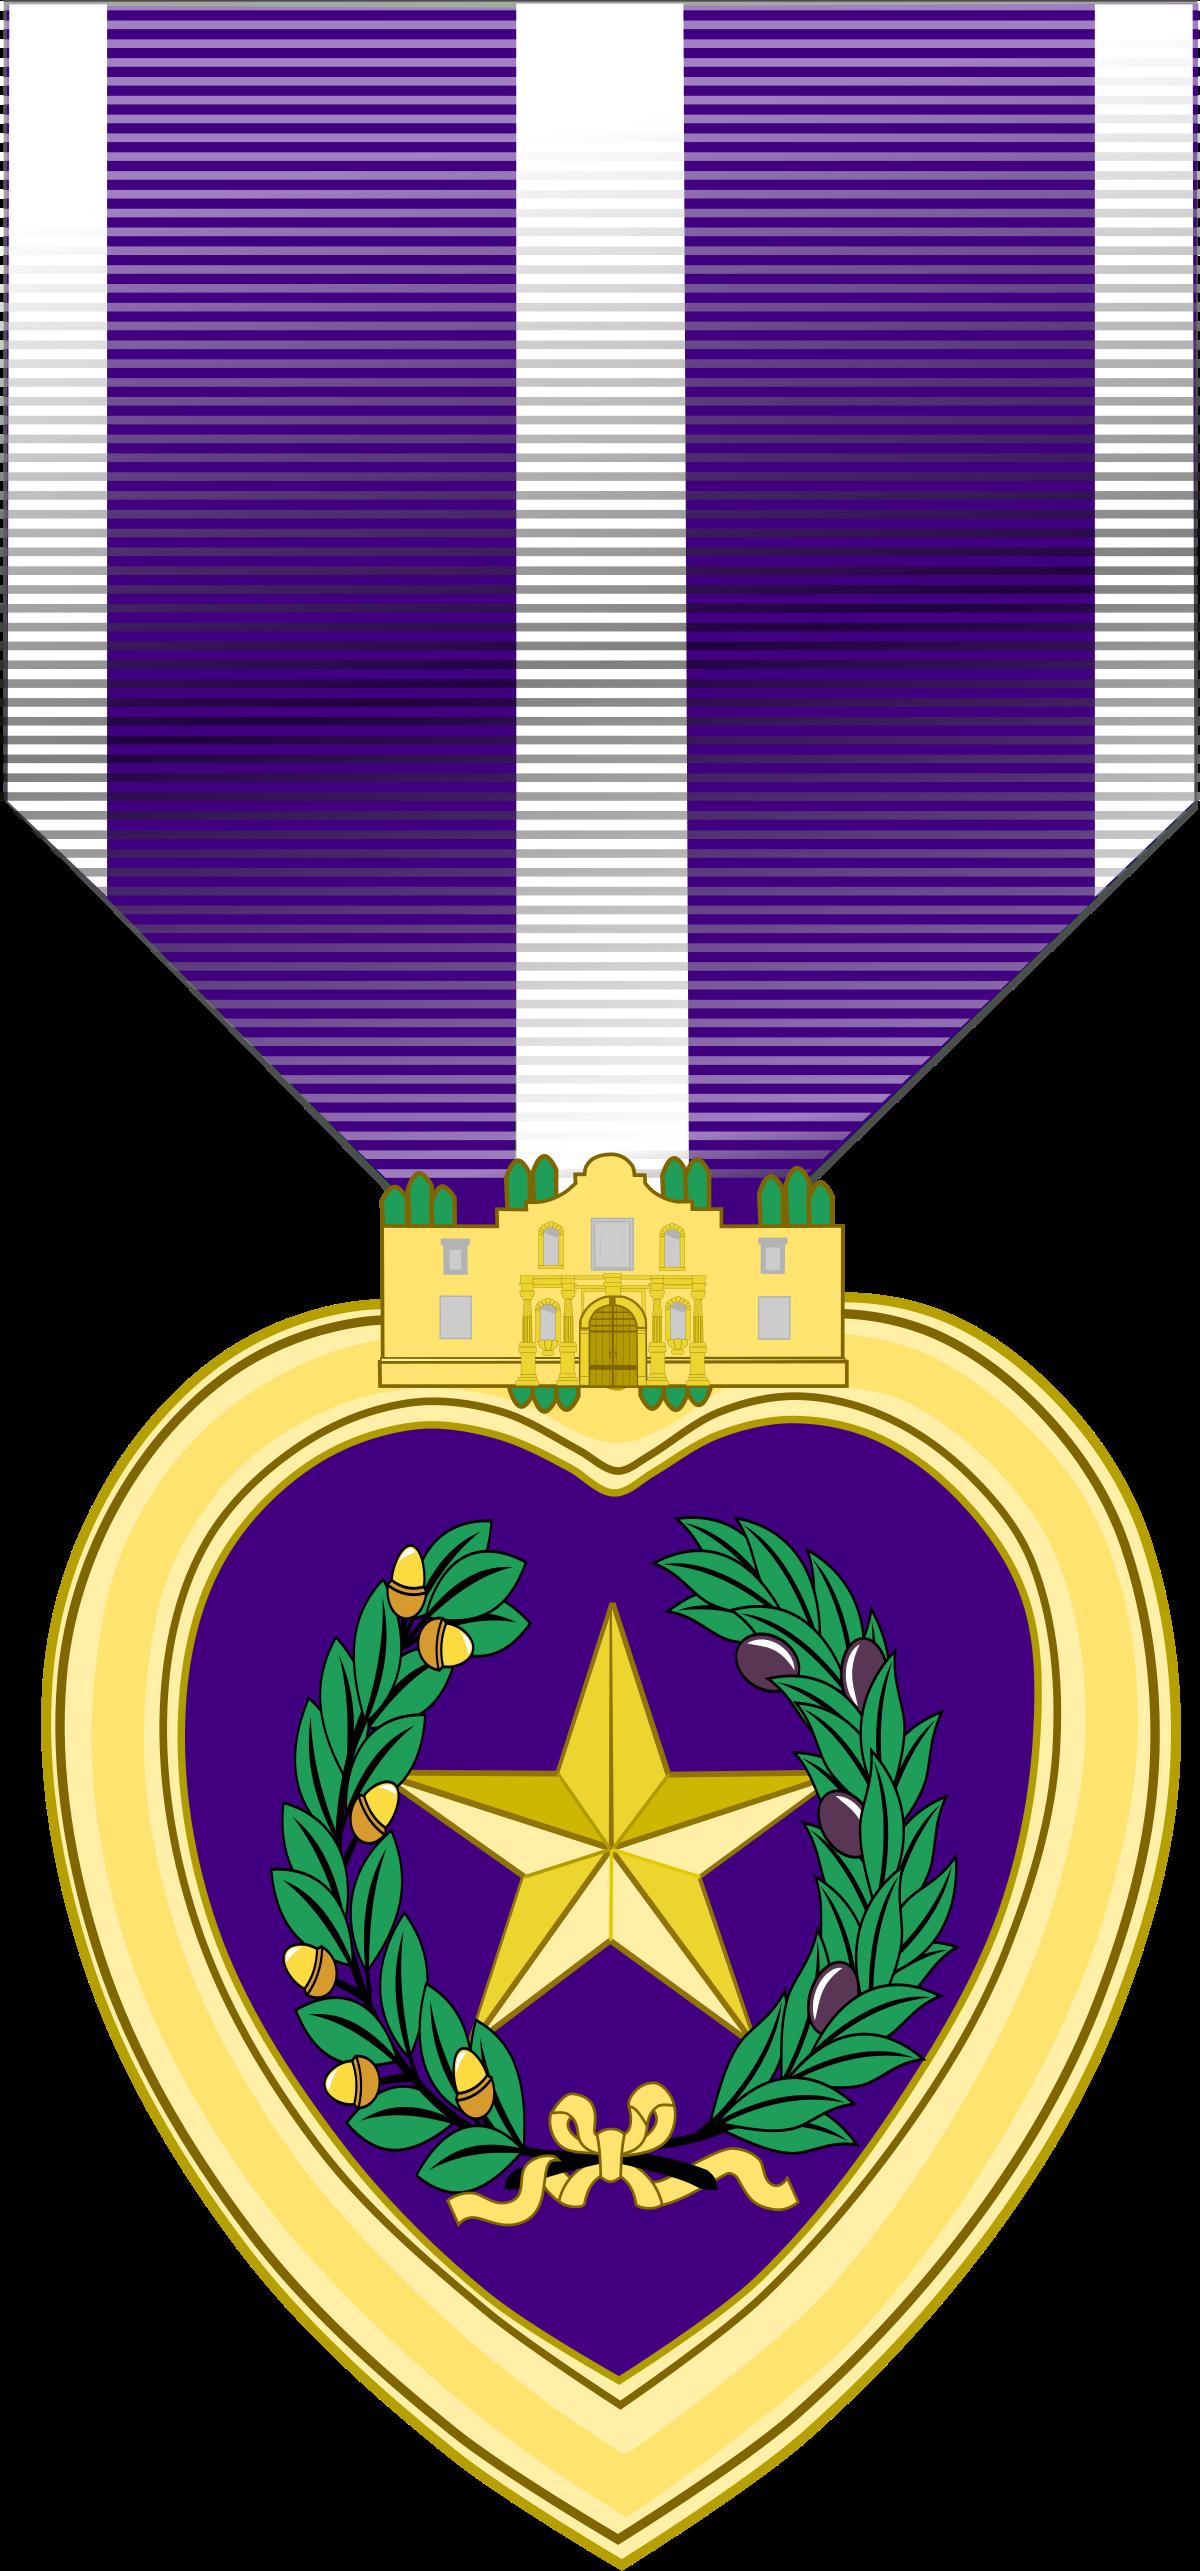 Texas Purple Heart Medal.